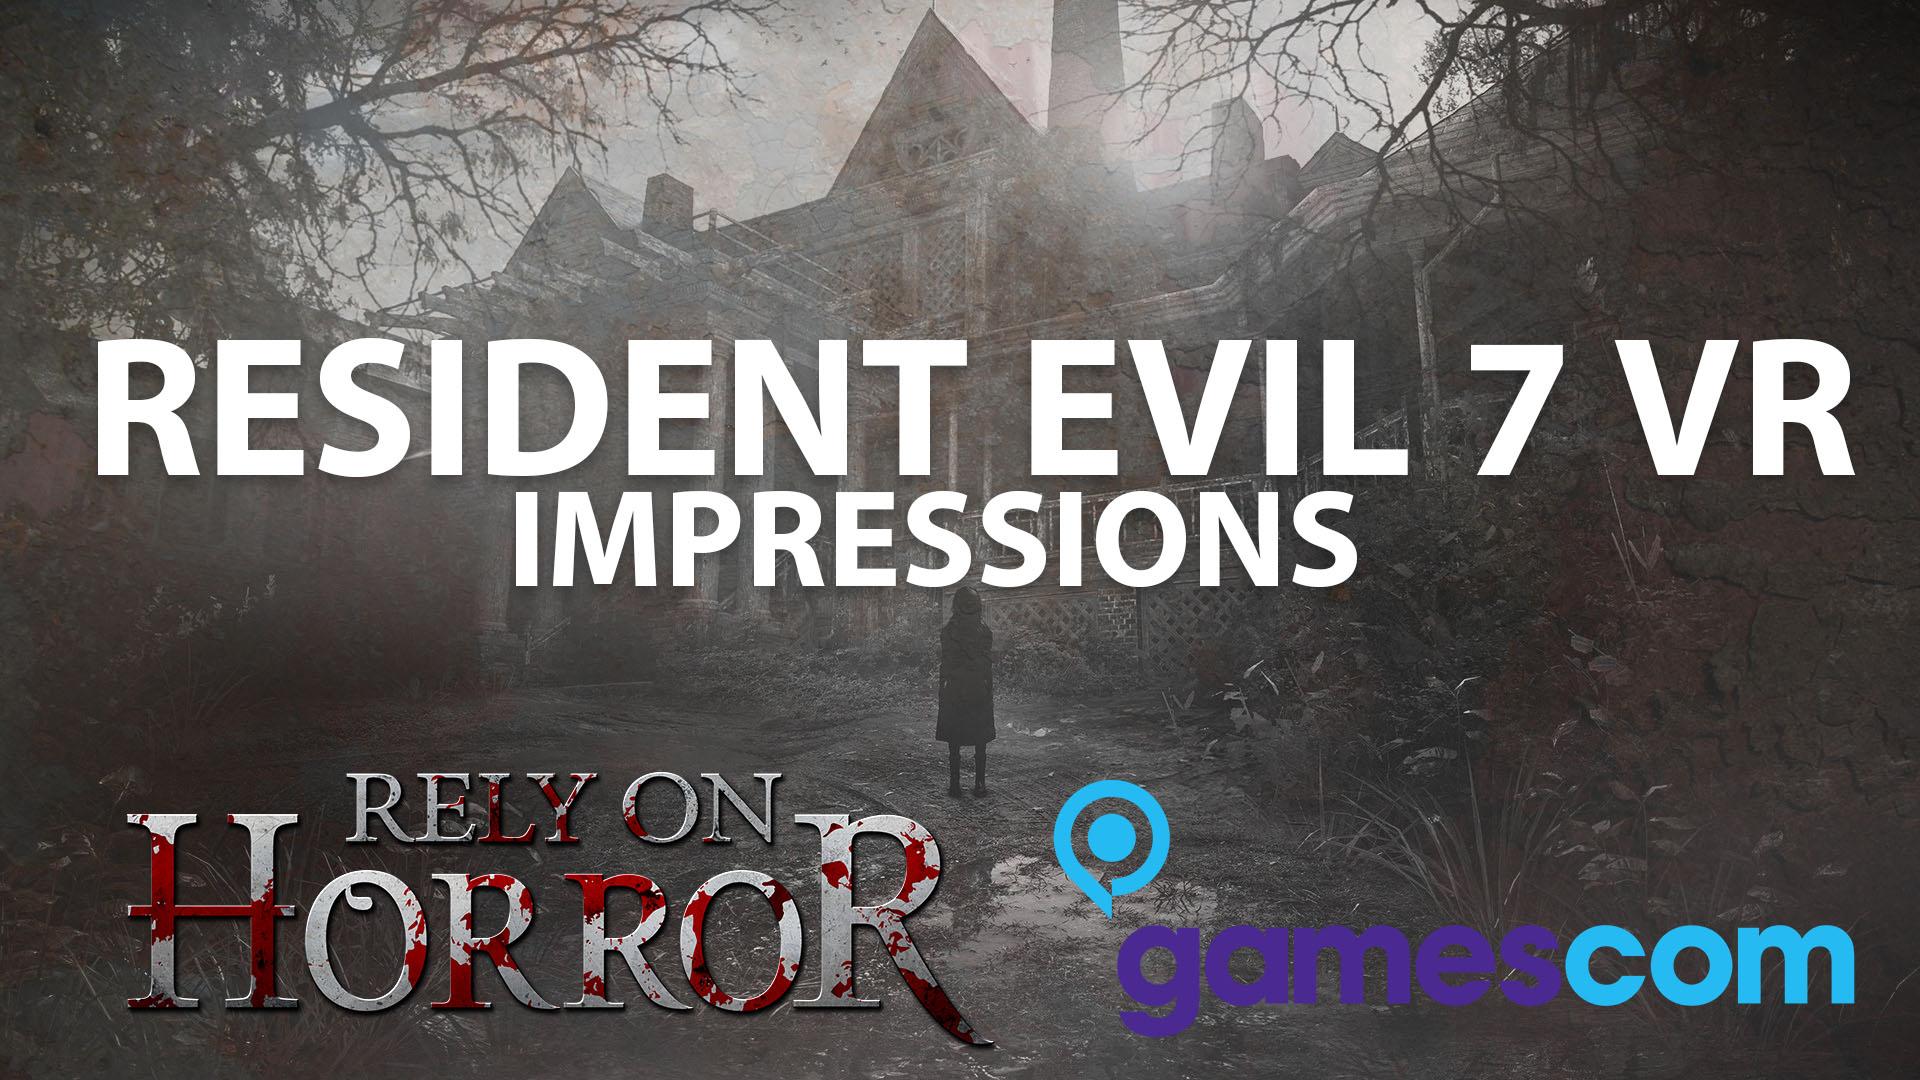 Gamescom 2016: Resident Evil 7 VR Impressions